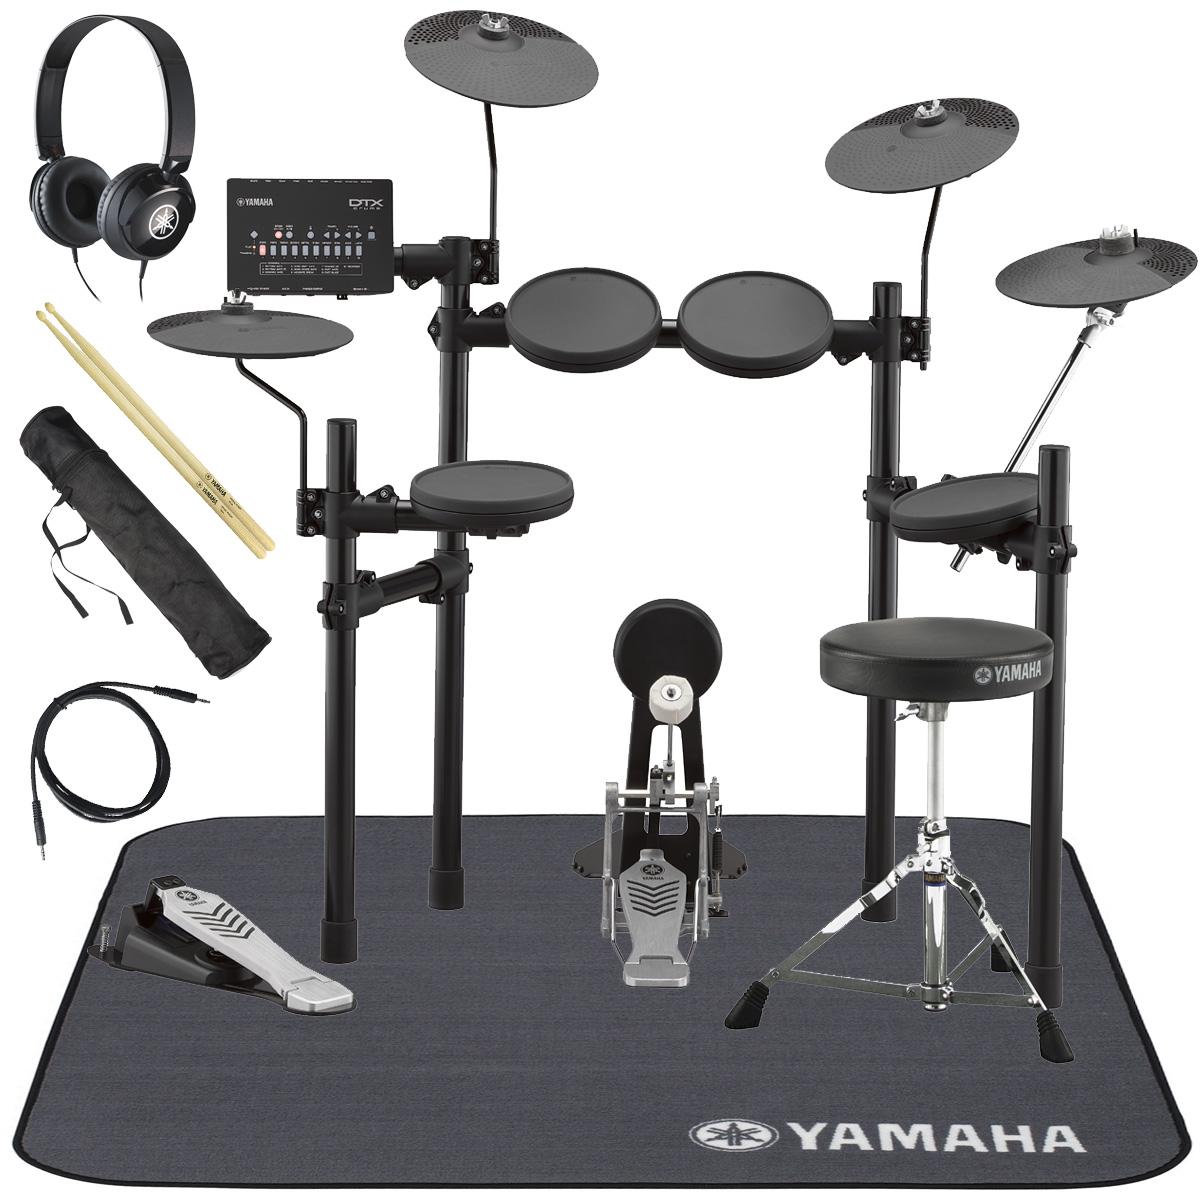 YAMAHA / DTX432KUPGS 電子ドラム ヤマハ純正ヘッドホンとスティックとマットセット【YRK】